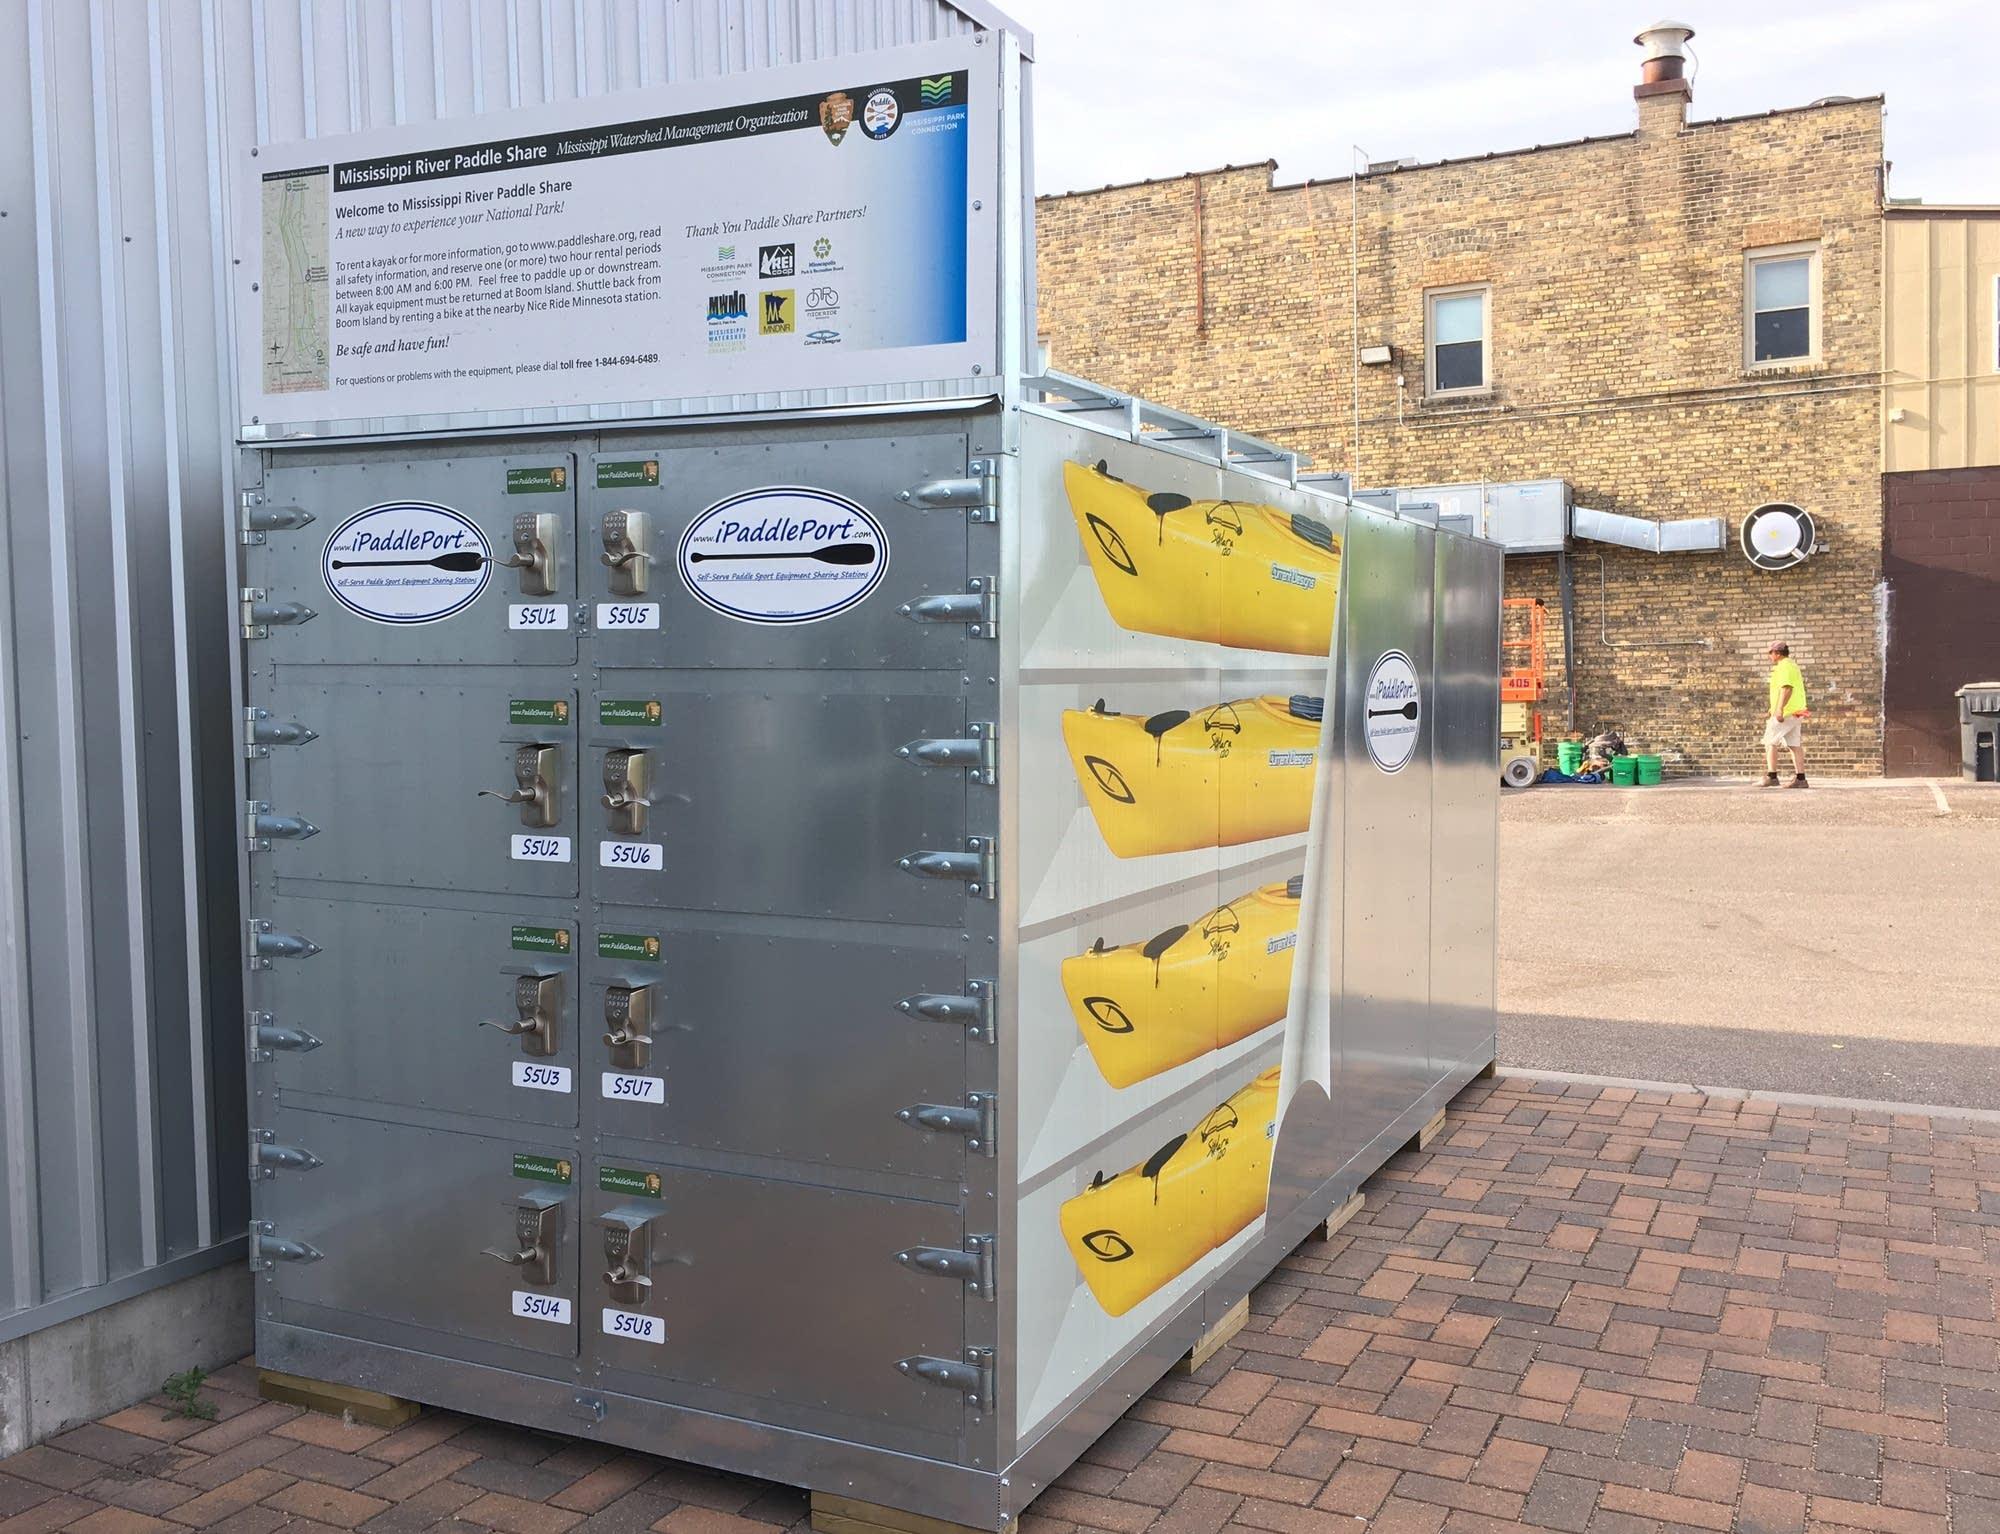 The Paddle Share locker near the Lowry Bridge